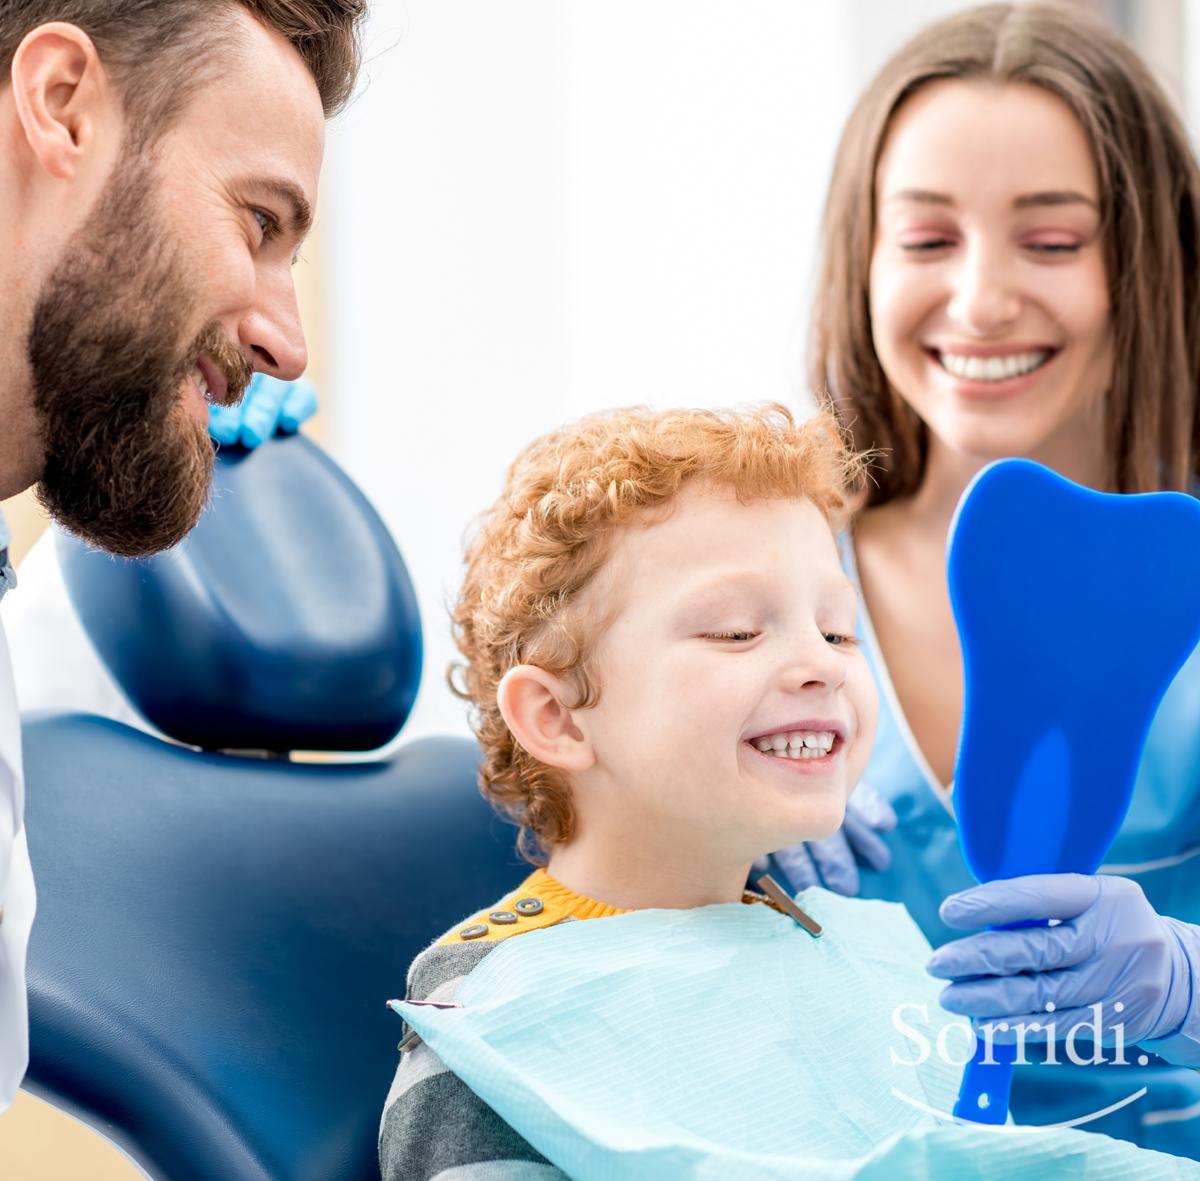 sorridi-ch-magazine-odontoiatria-infantile